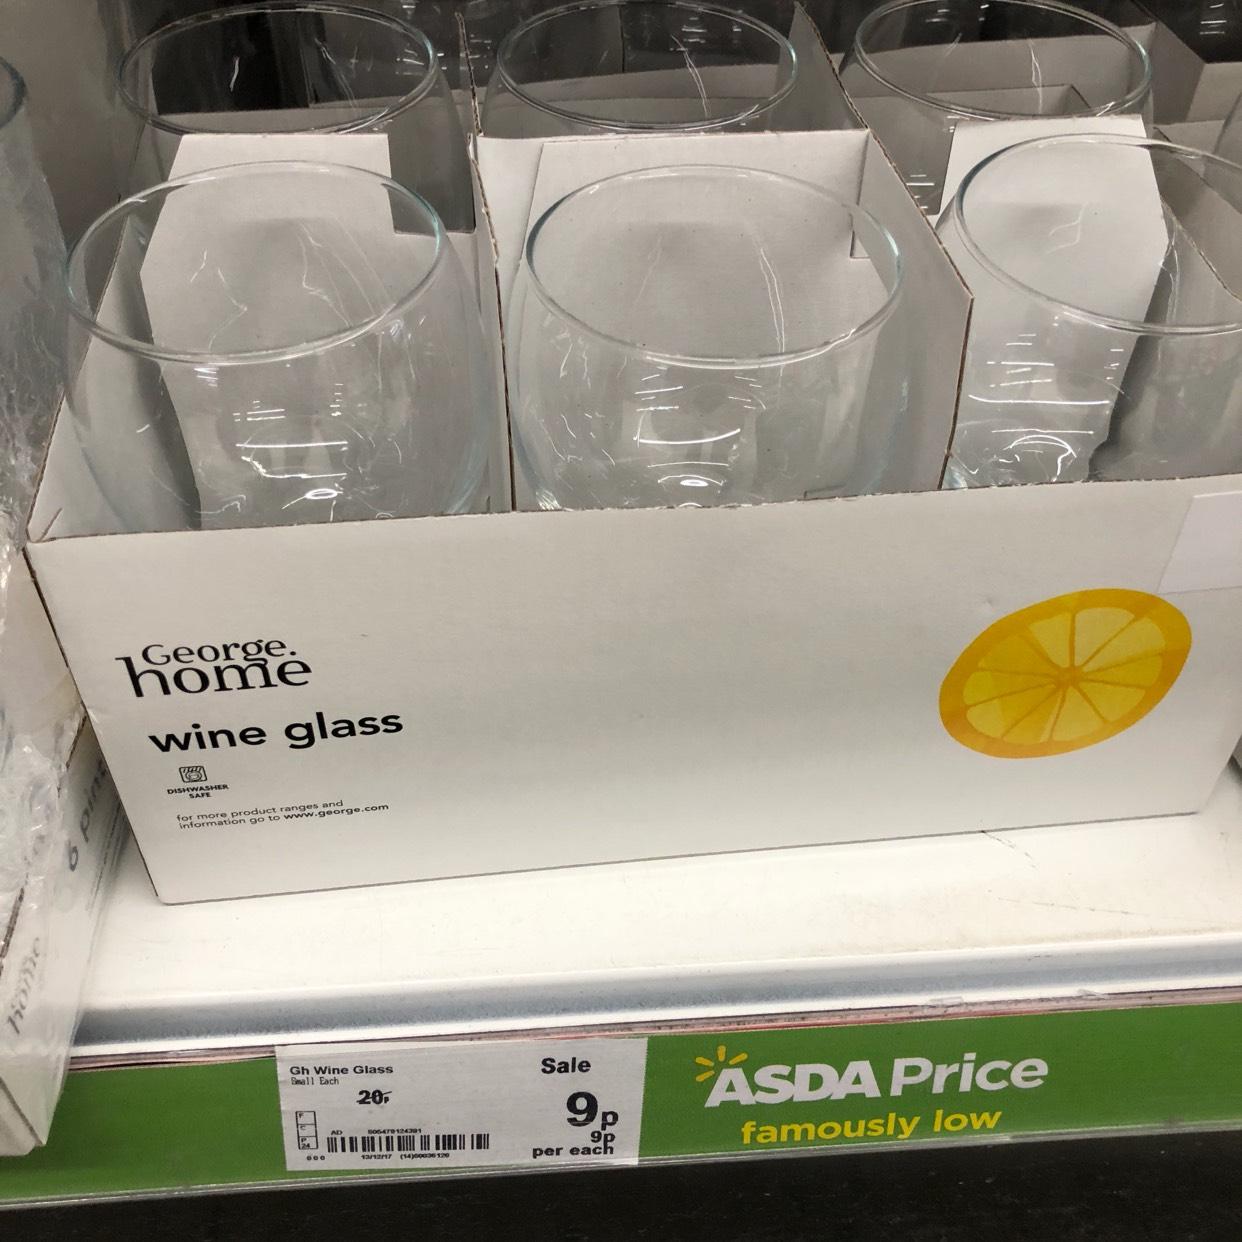 ASDA Wine Glass 9p Each - instore